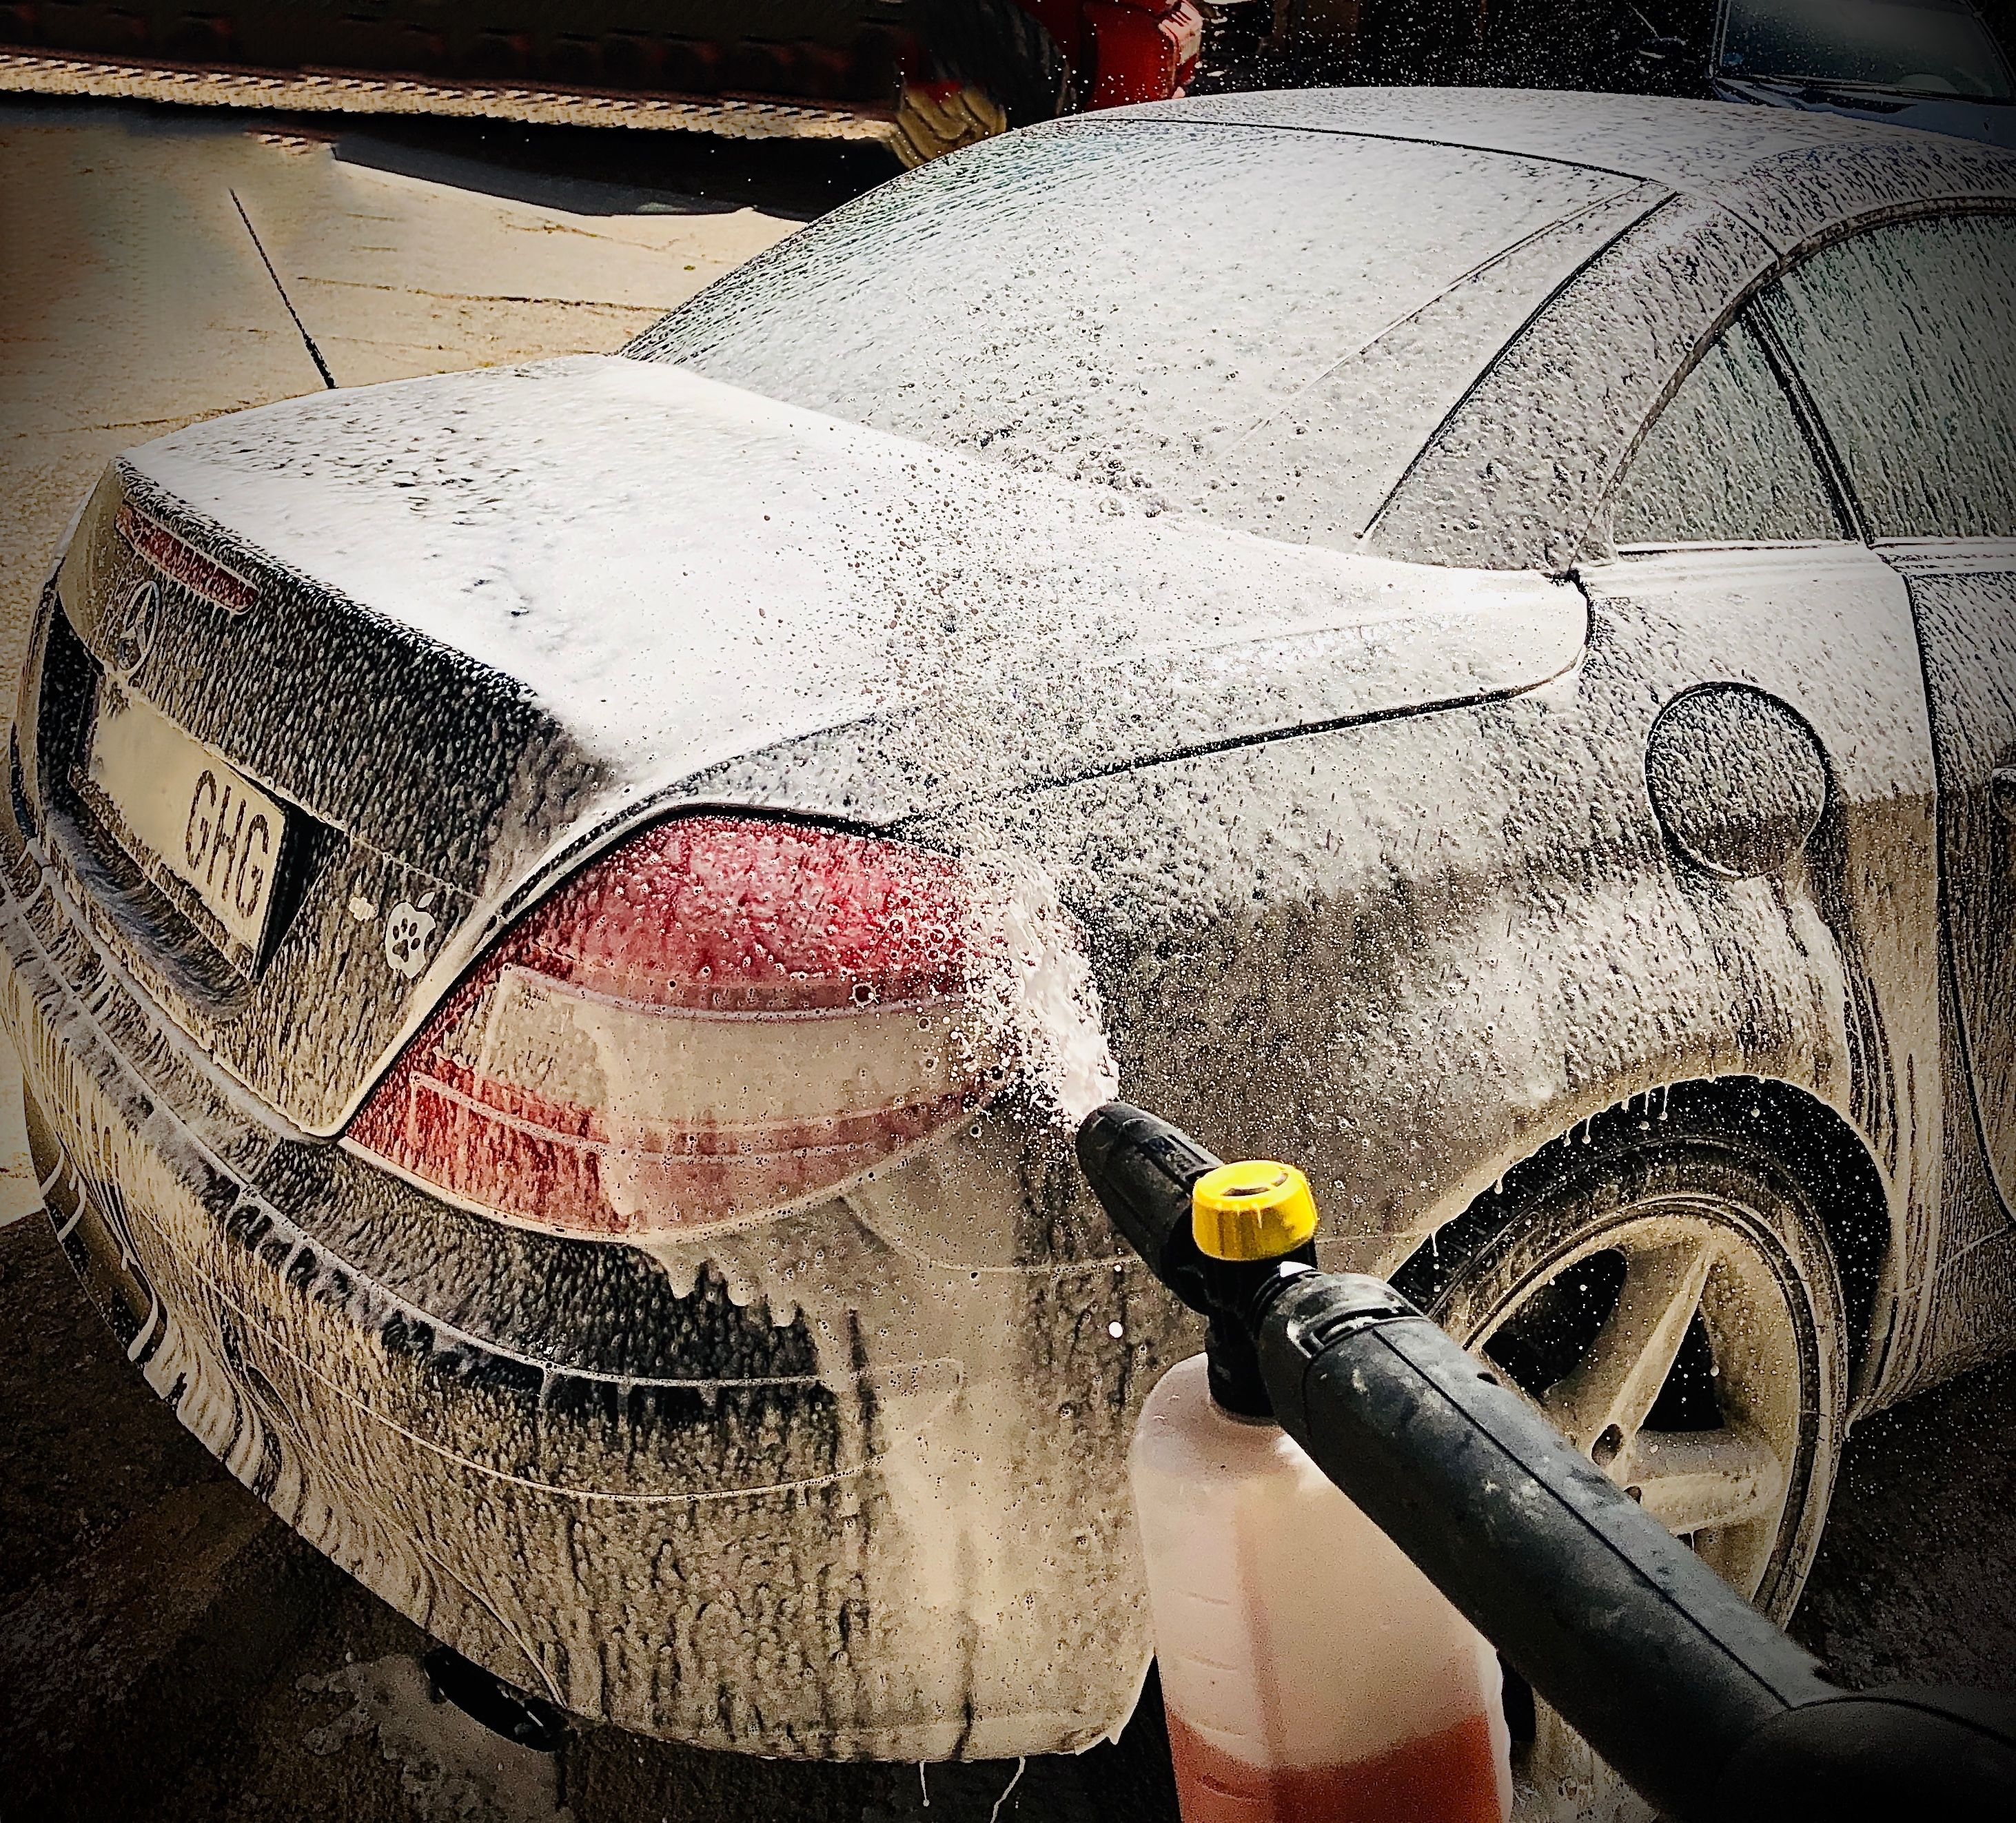 Supercar Duo Luxurycorp Rollsroyce: Idea De SJAKK En Mercedes Benz